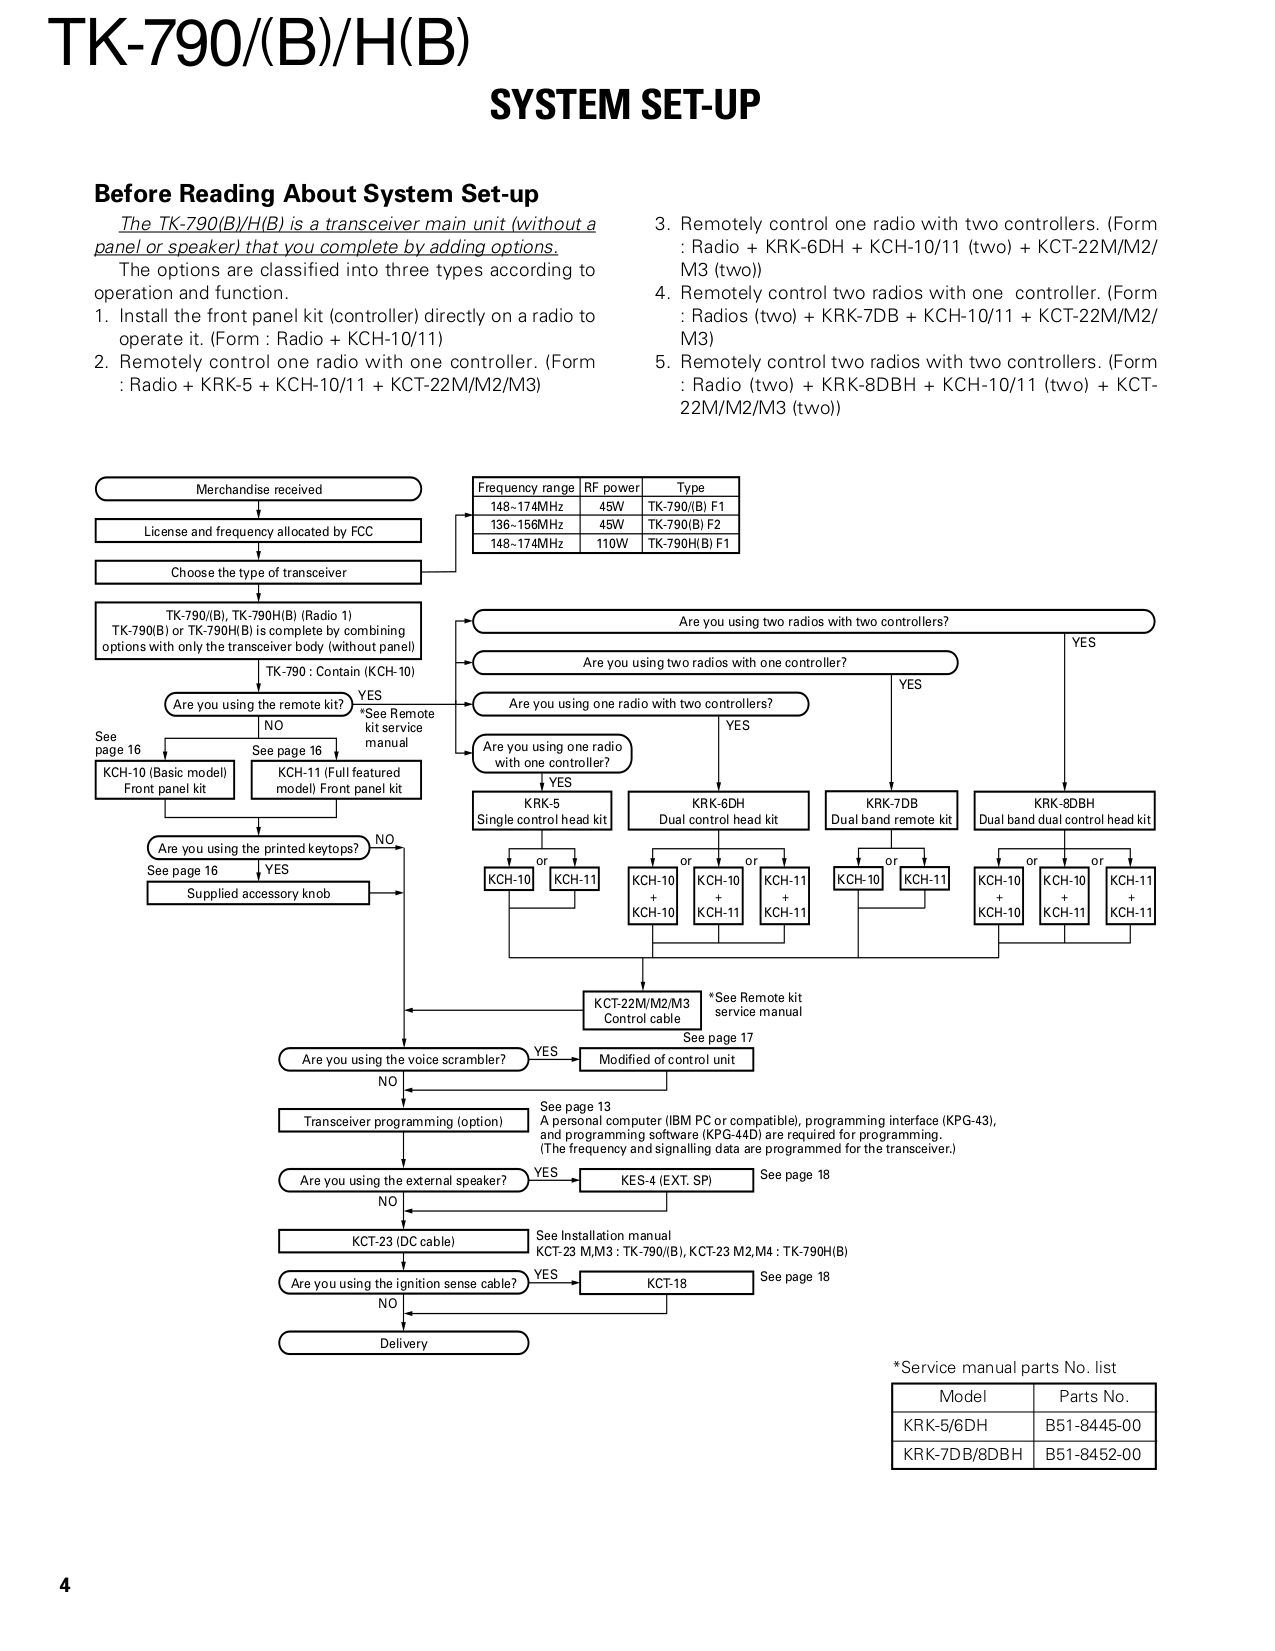 pdf manual for kenwood radio kt 592 rh umlib com kenwood tk 790 service manual kenwood tk-790h service manual